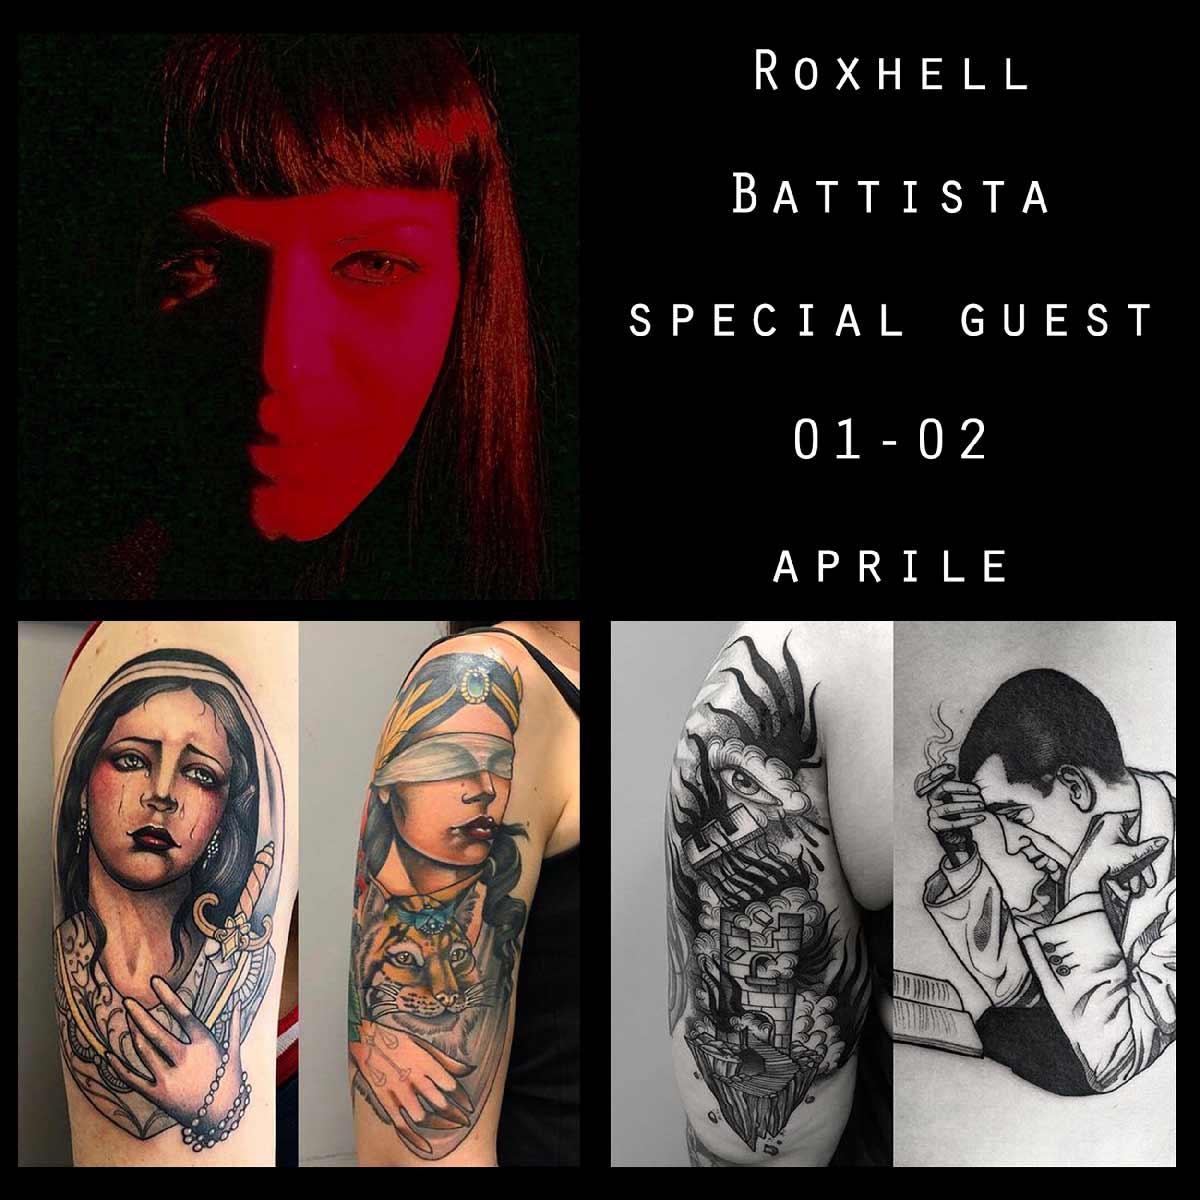 Roxhell Battista Tattooer | Special Guest| Inside Tattoo Shop di Donna Mayla | Alba Adriatica | Tatuaggi | Piercing